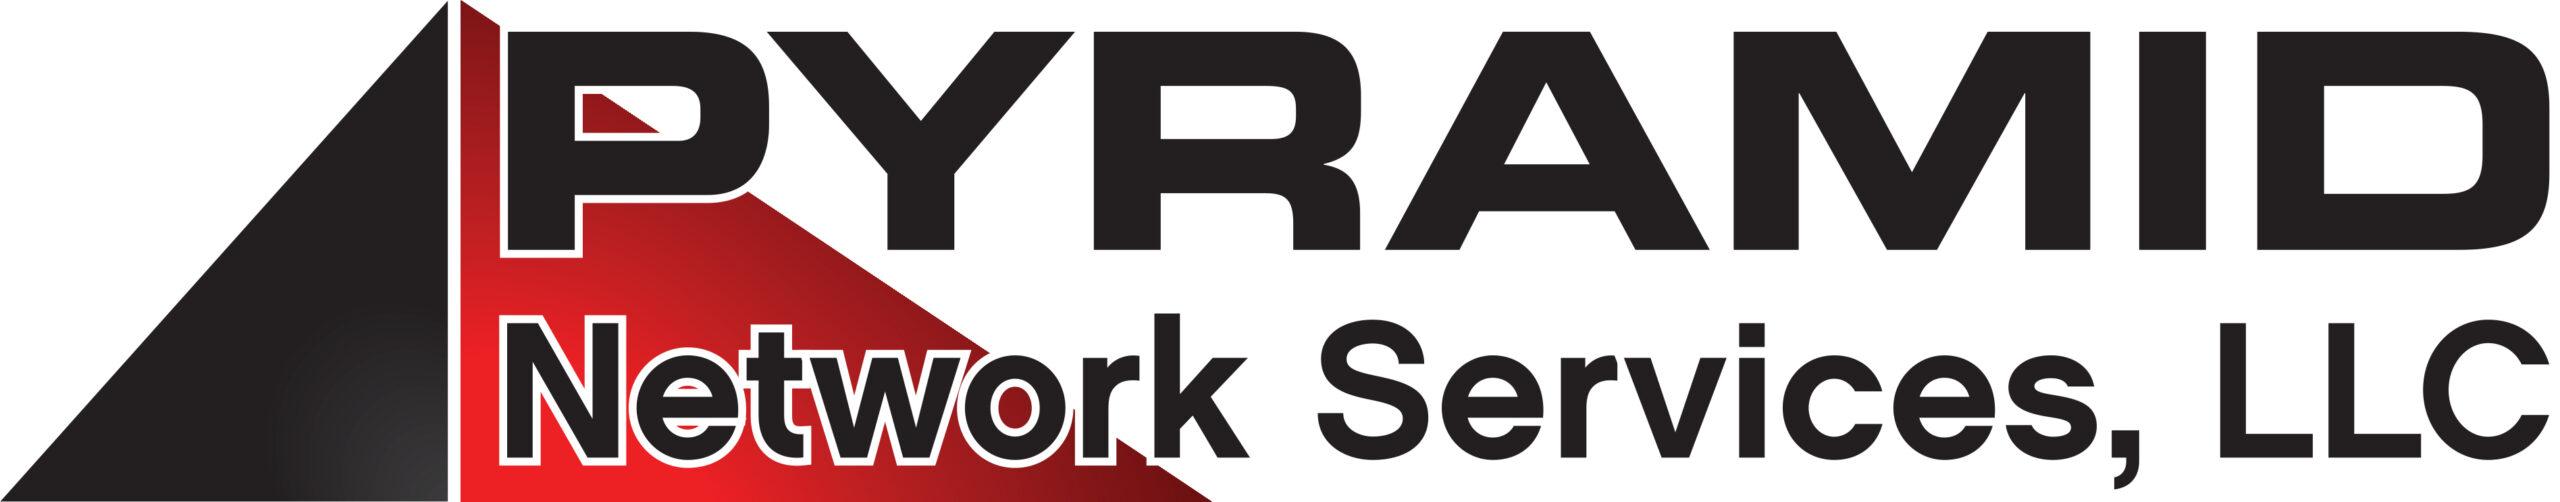 Pyramid Network Services, LLC